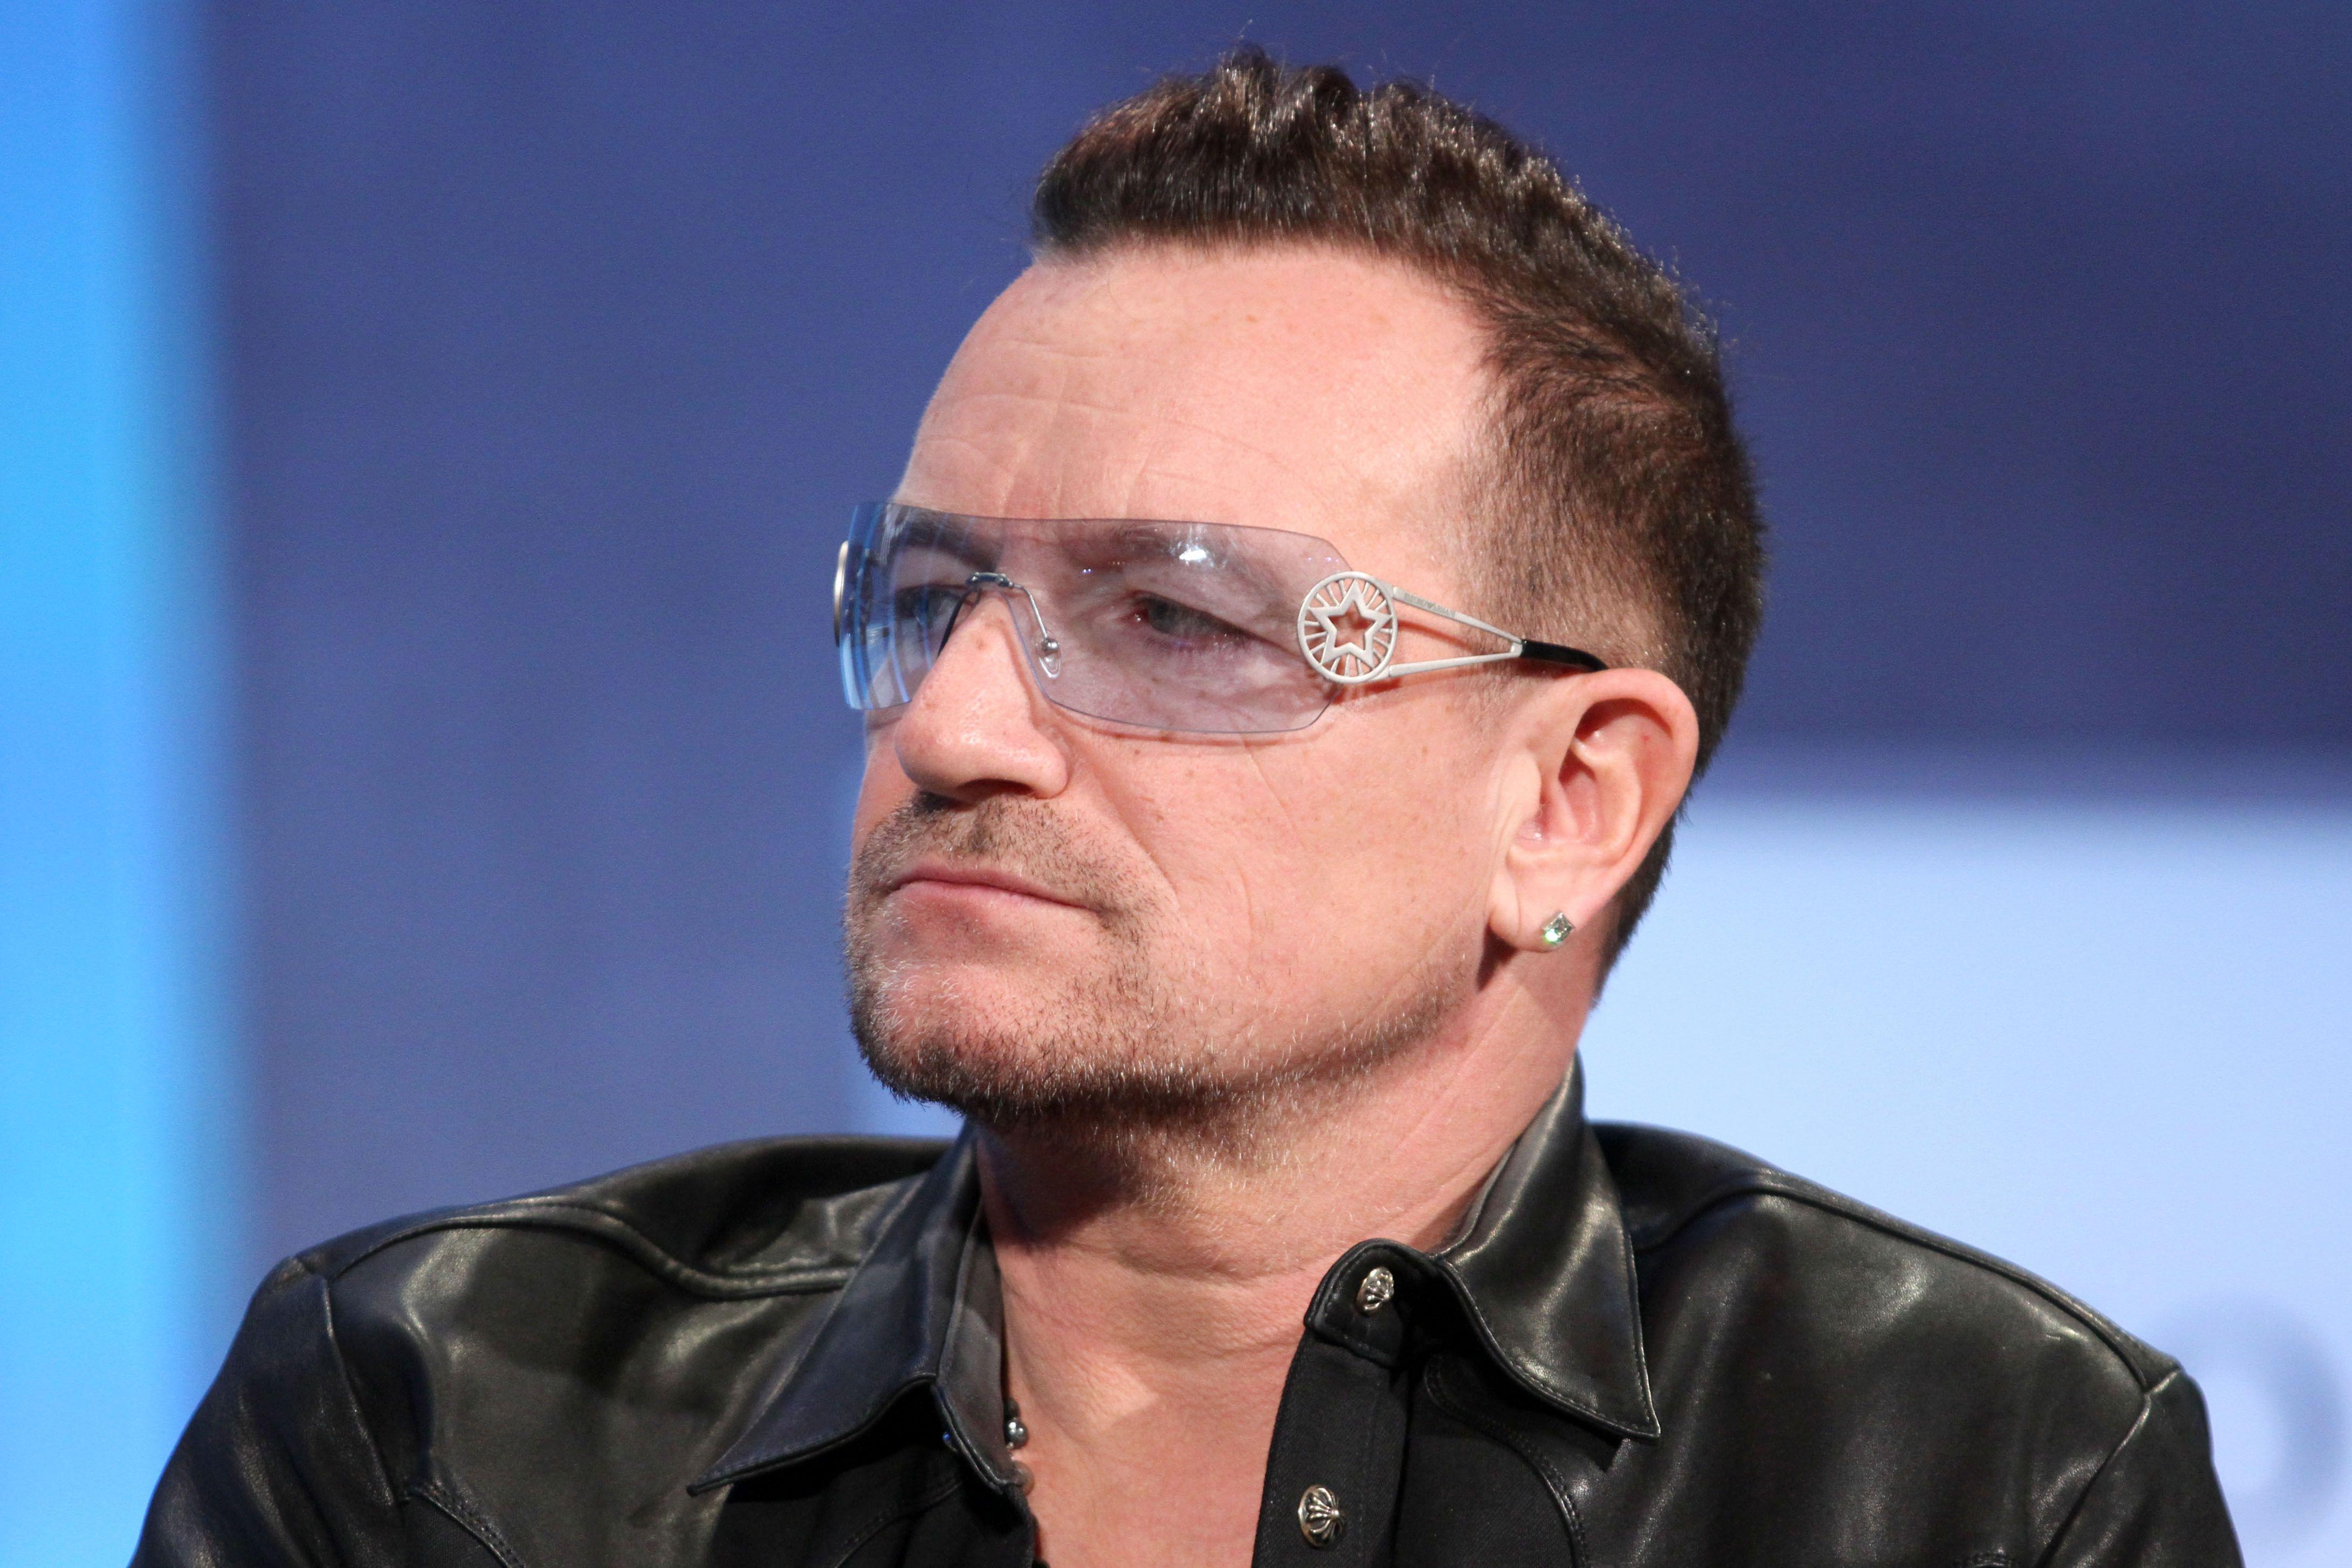 3. Bono